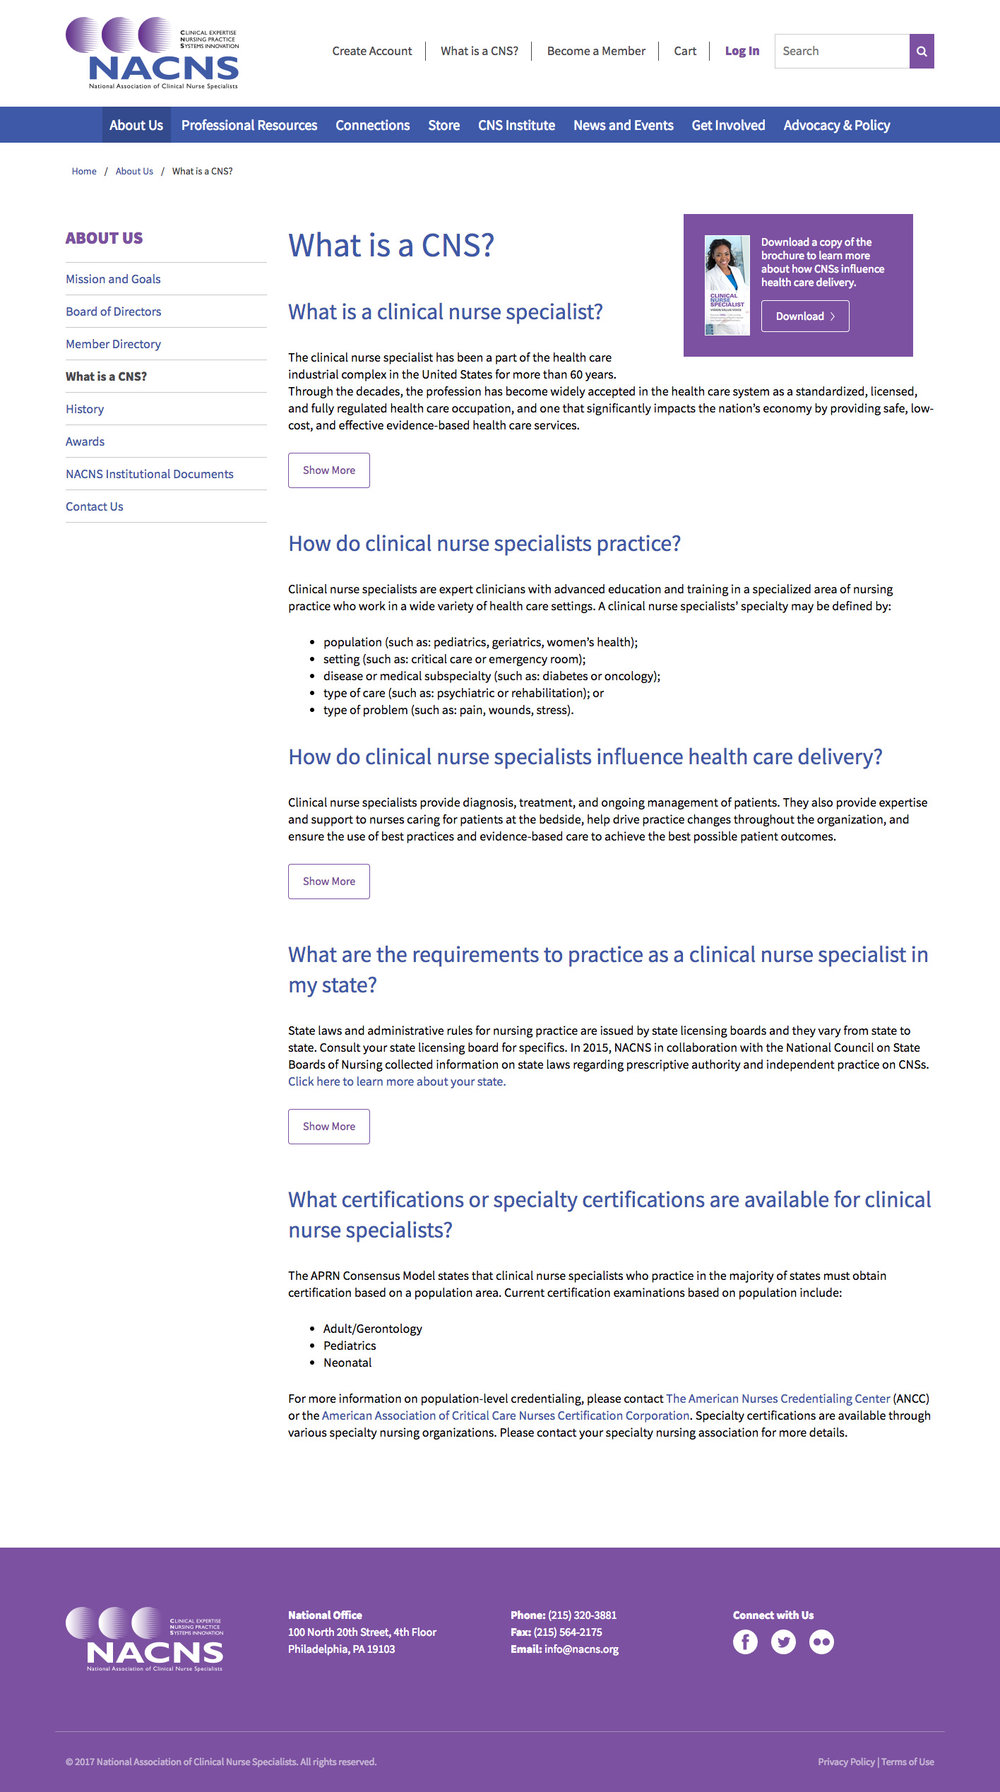 hcu-desktop-library.jpg